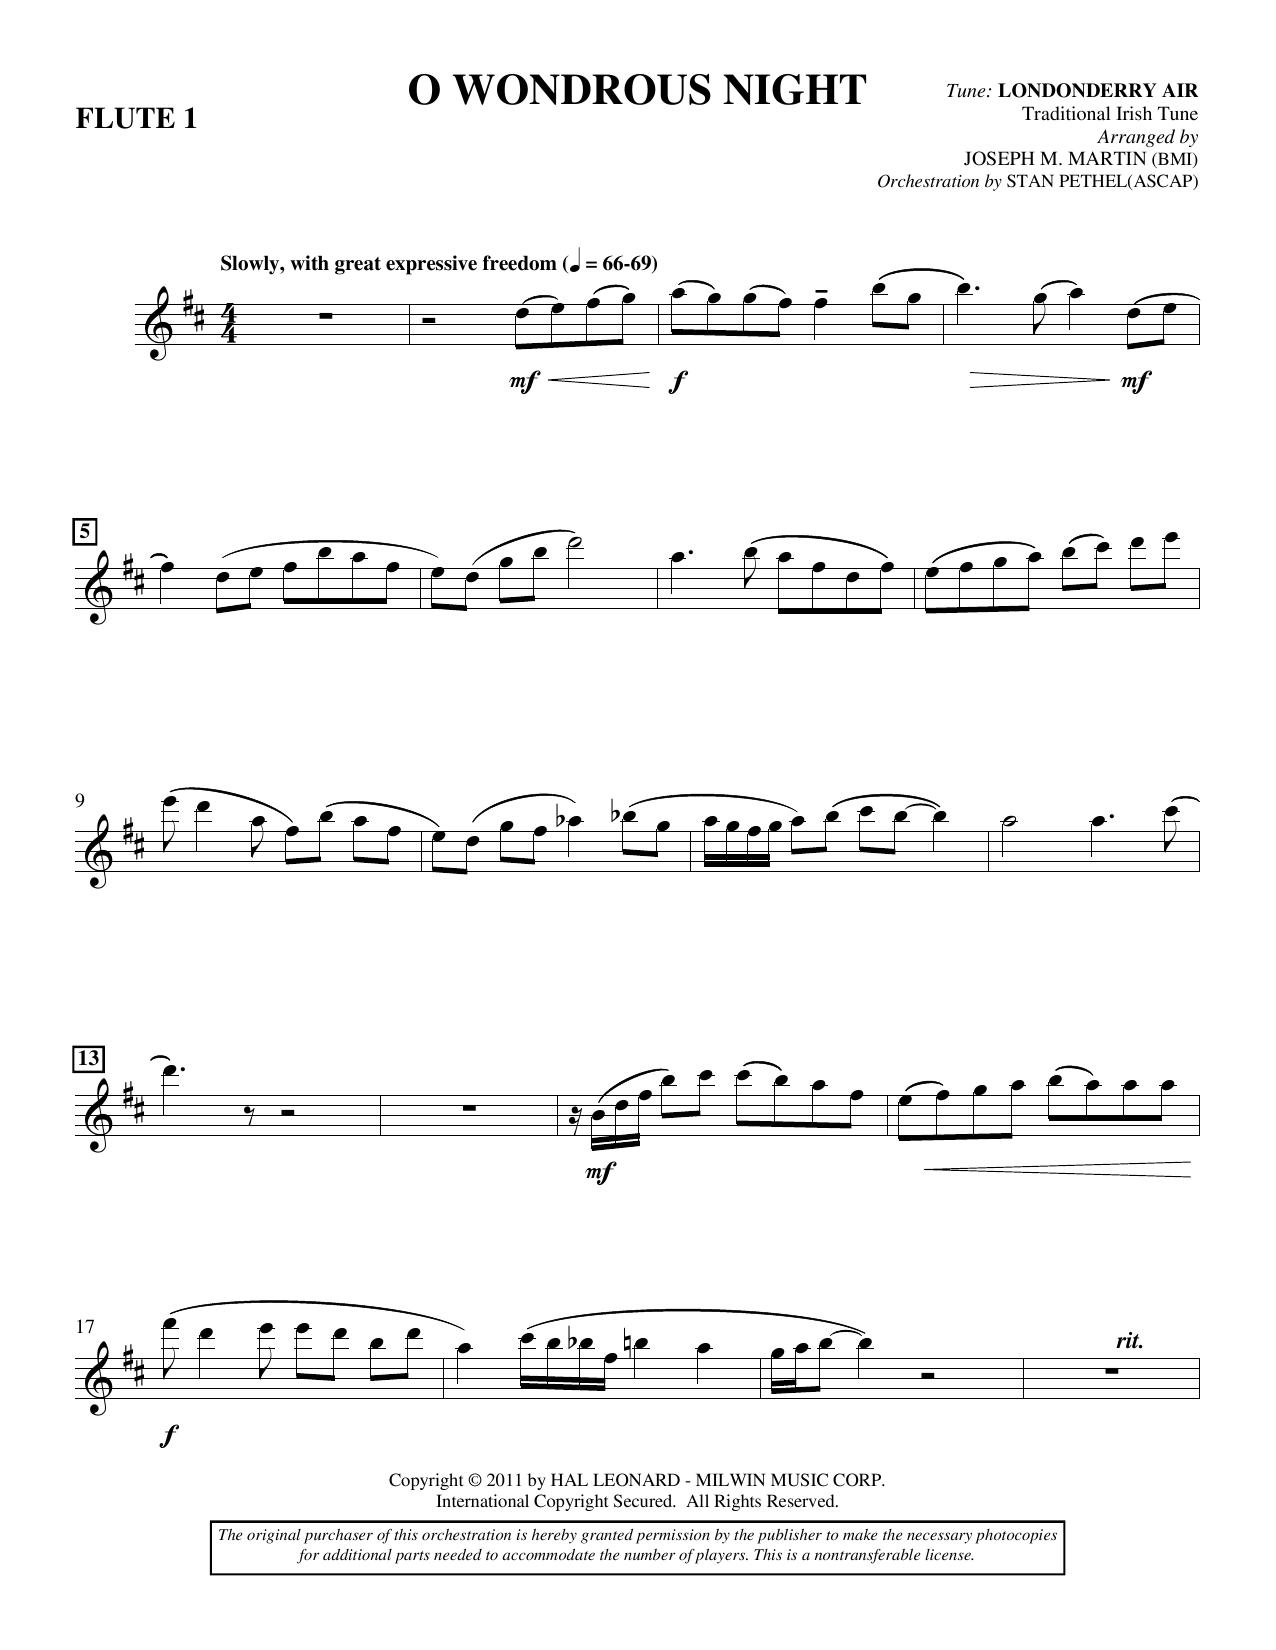 Joseph M. Martin O Wondrous Night - Flute 1 sheet music notes and chords. Download Printable PDF.